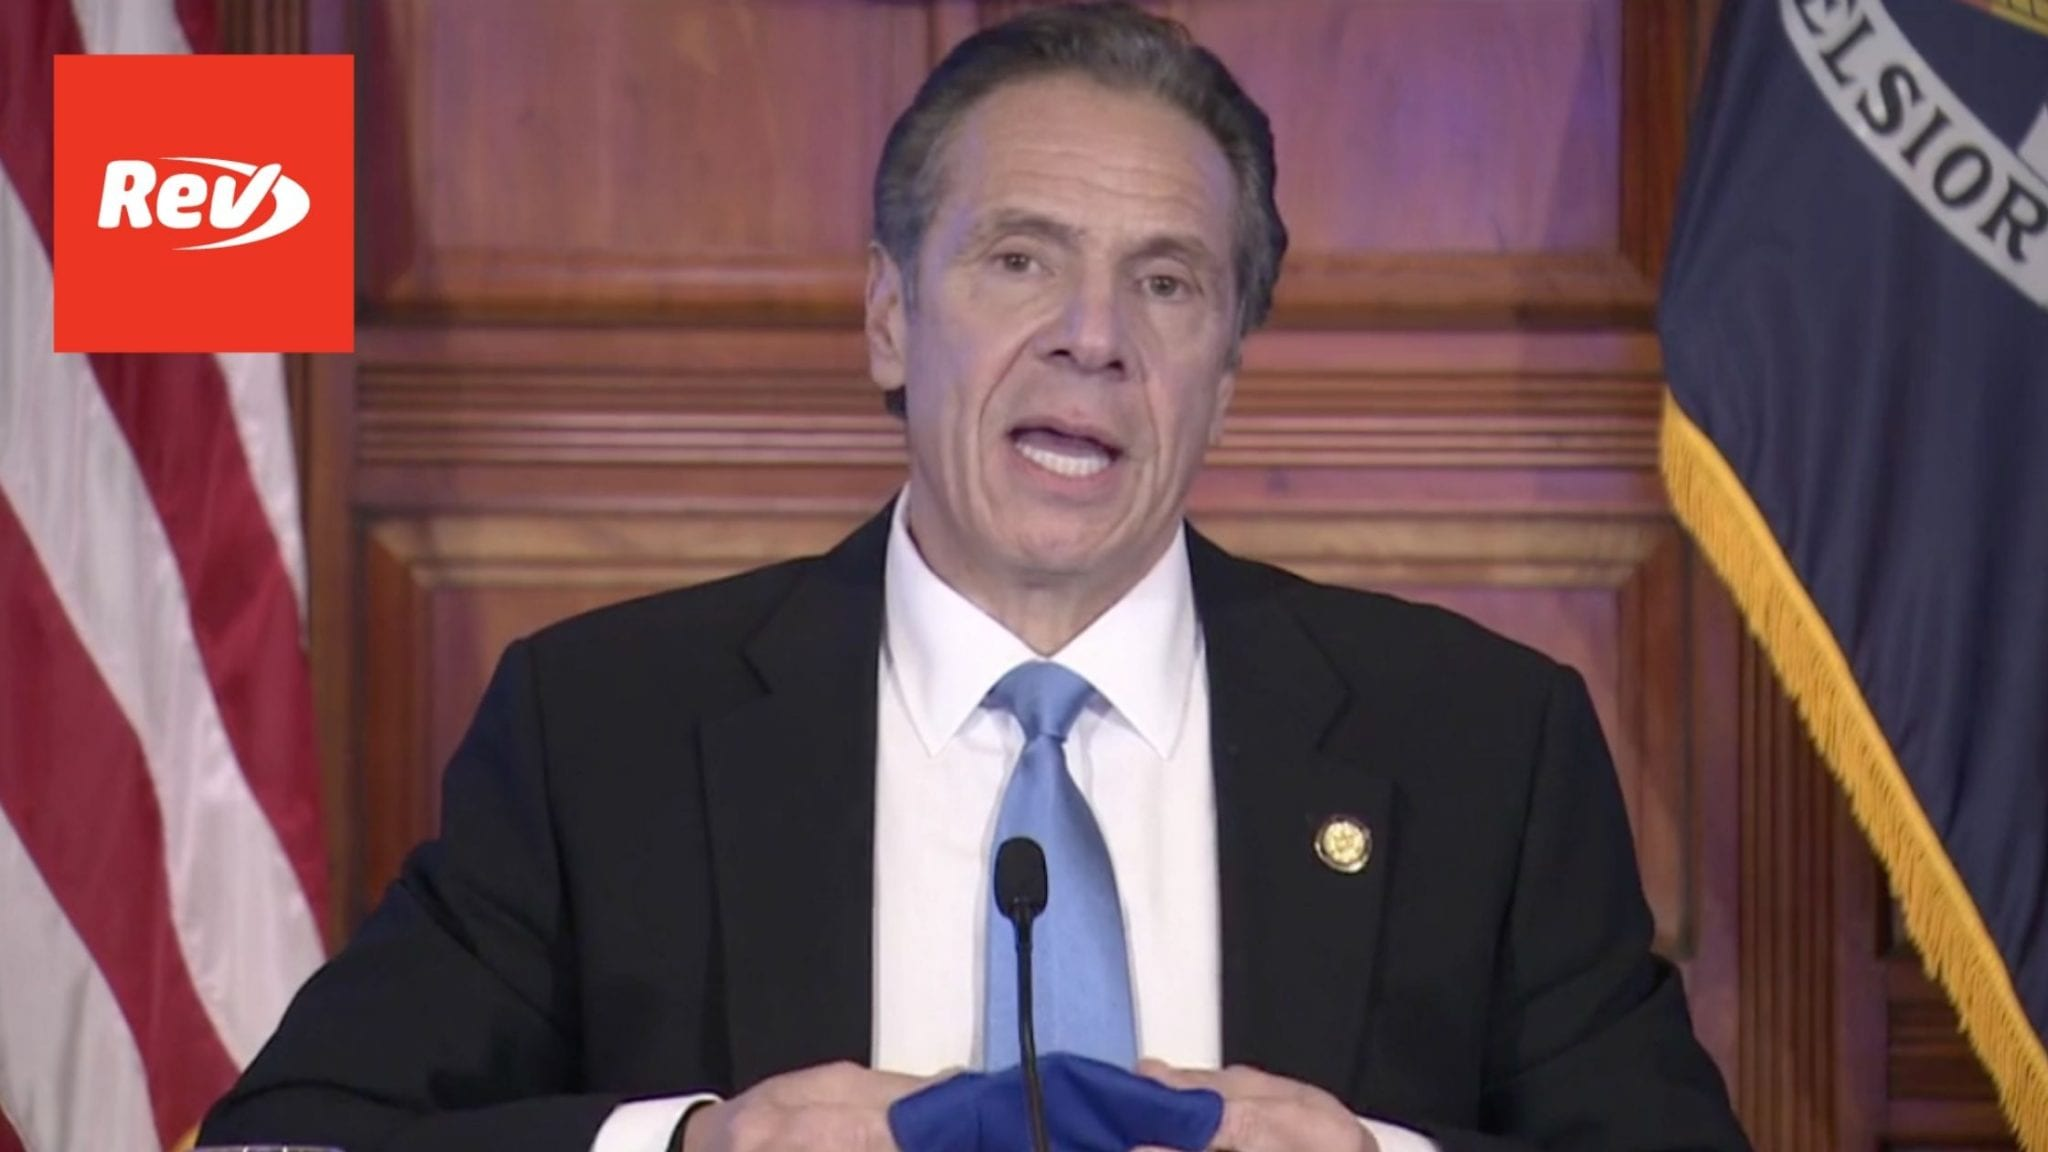 NY Gov. Andrew Cuomo Press Conference on COVID-19, Capitol Riot Transcript January 8